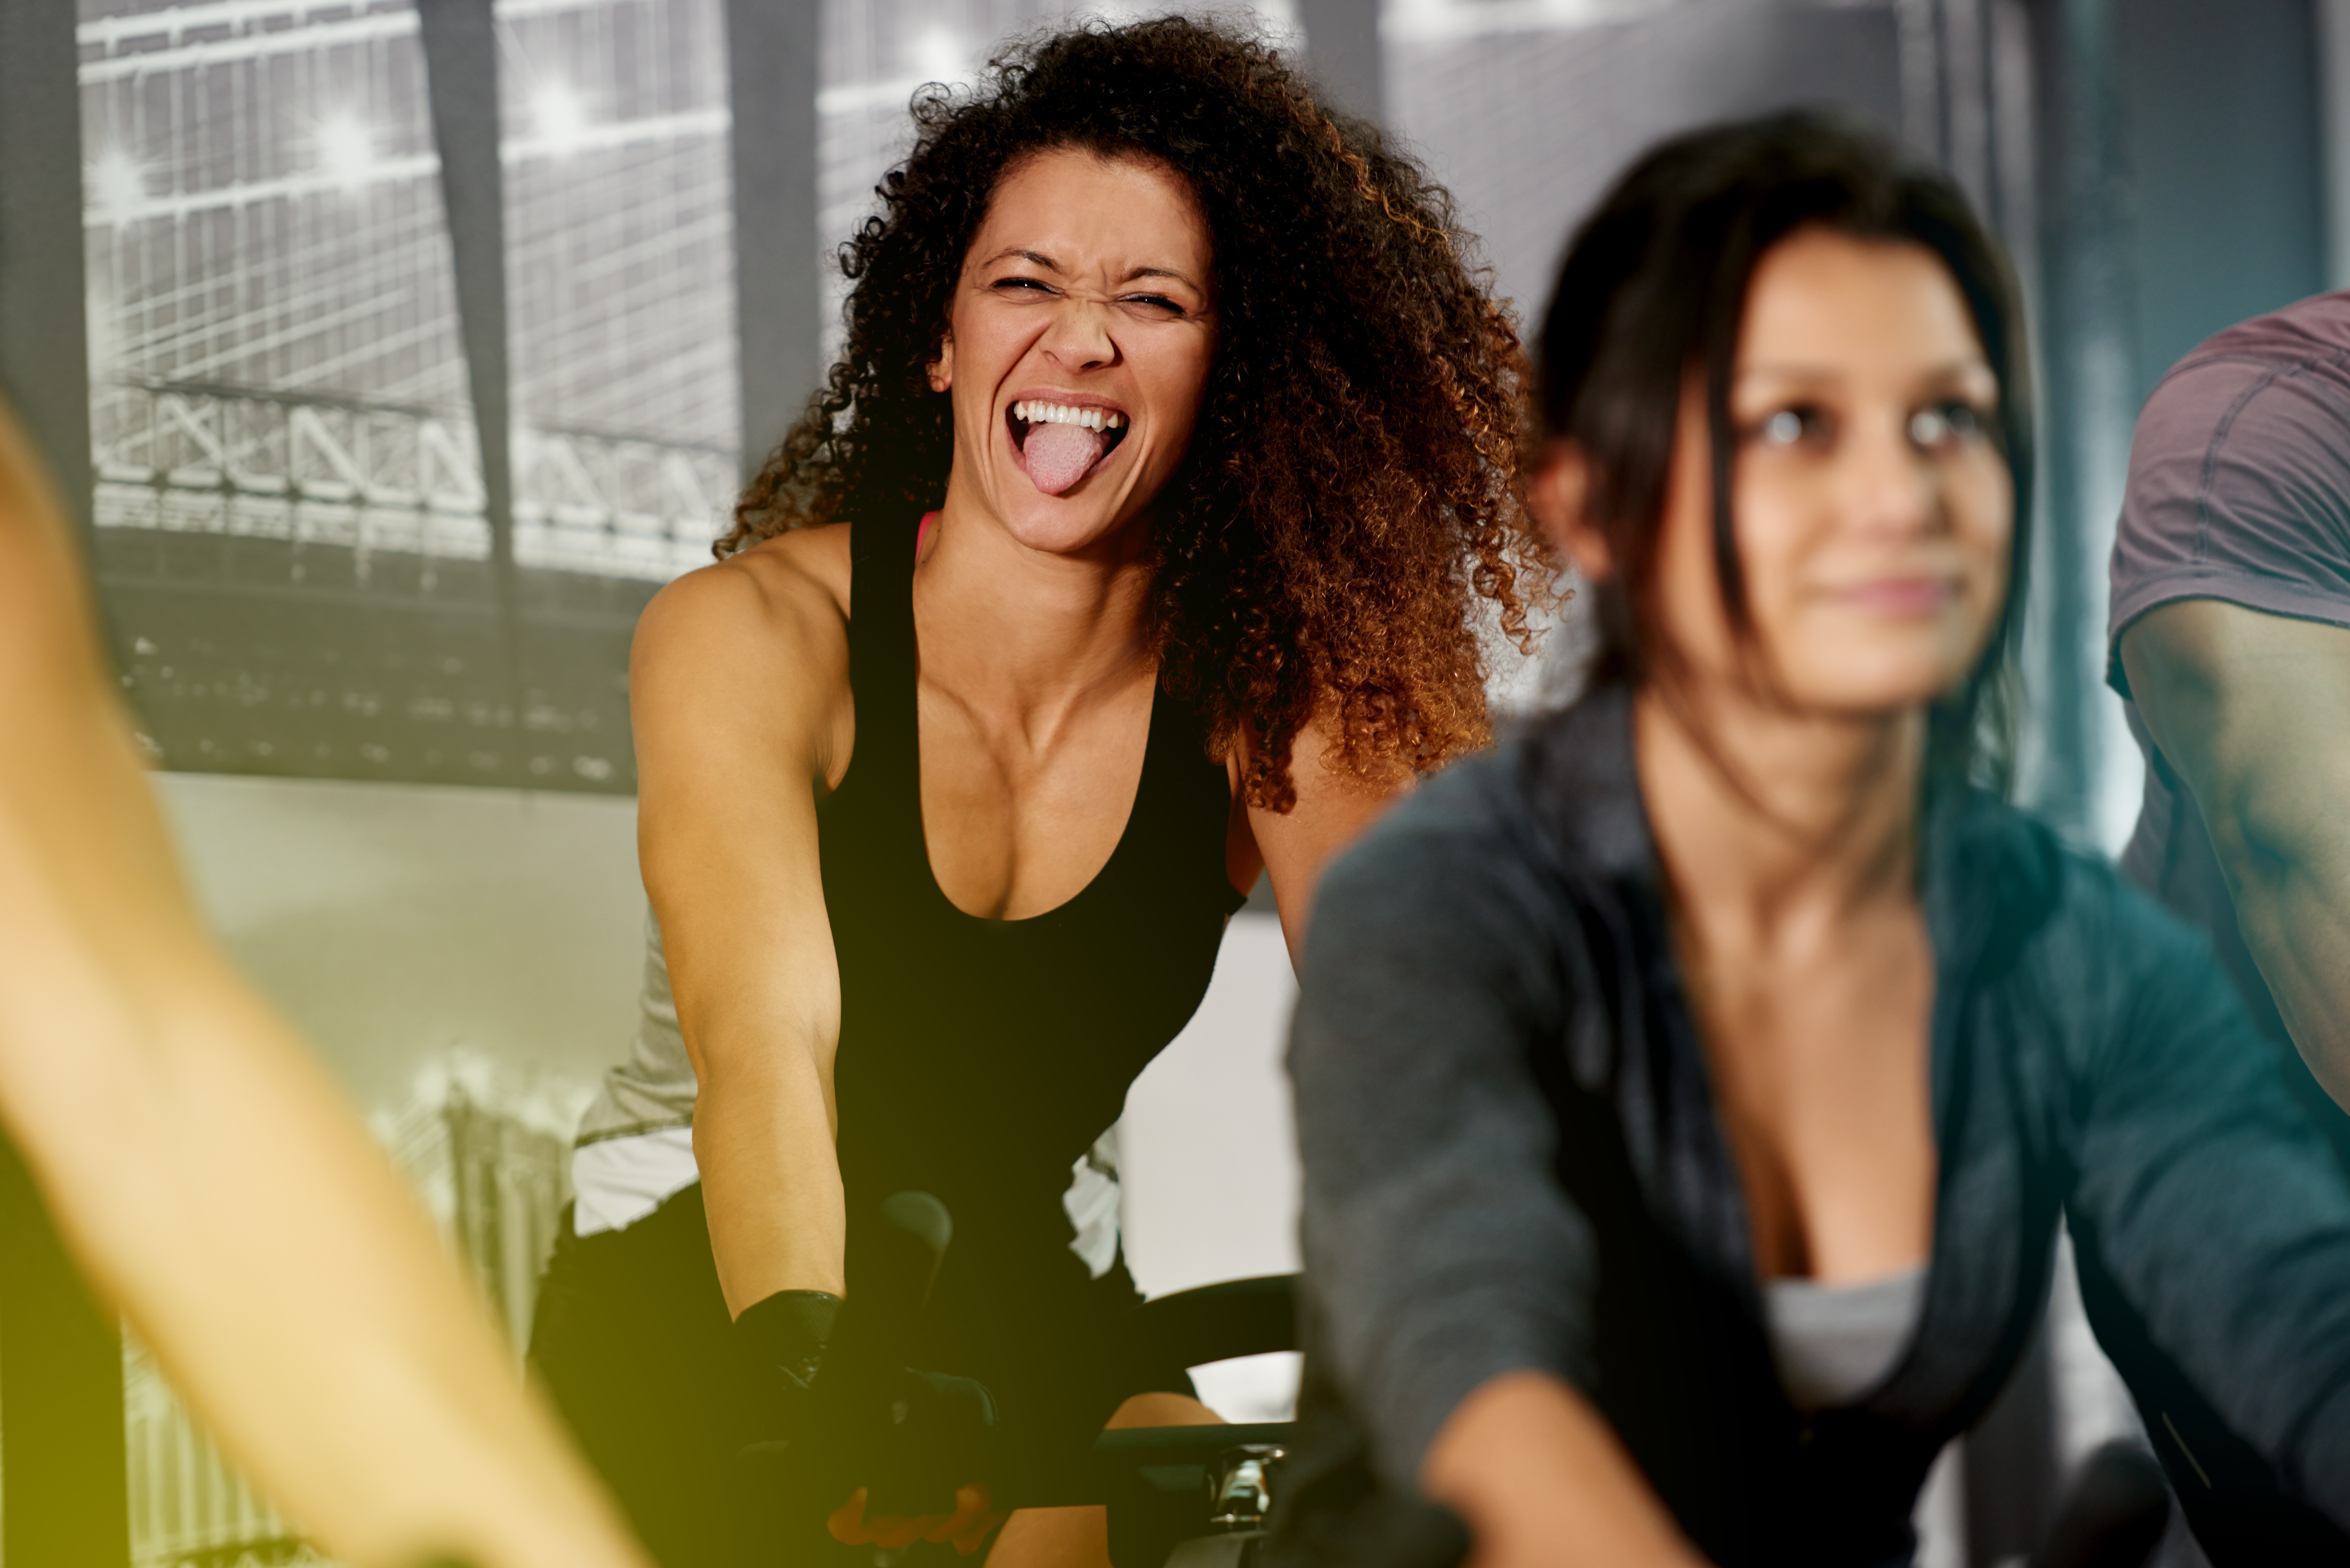 mnulti-gym membership - no contract